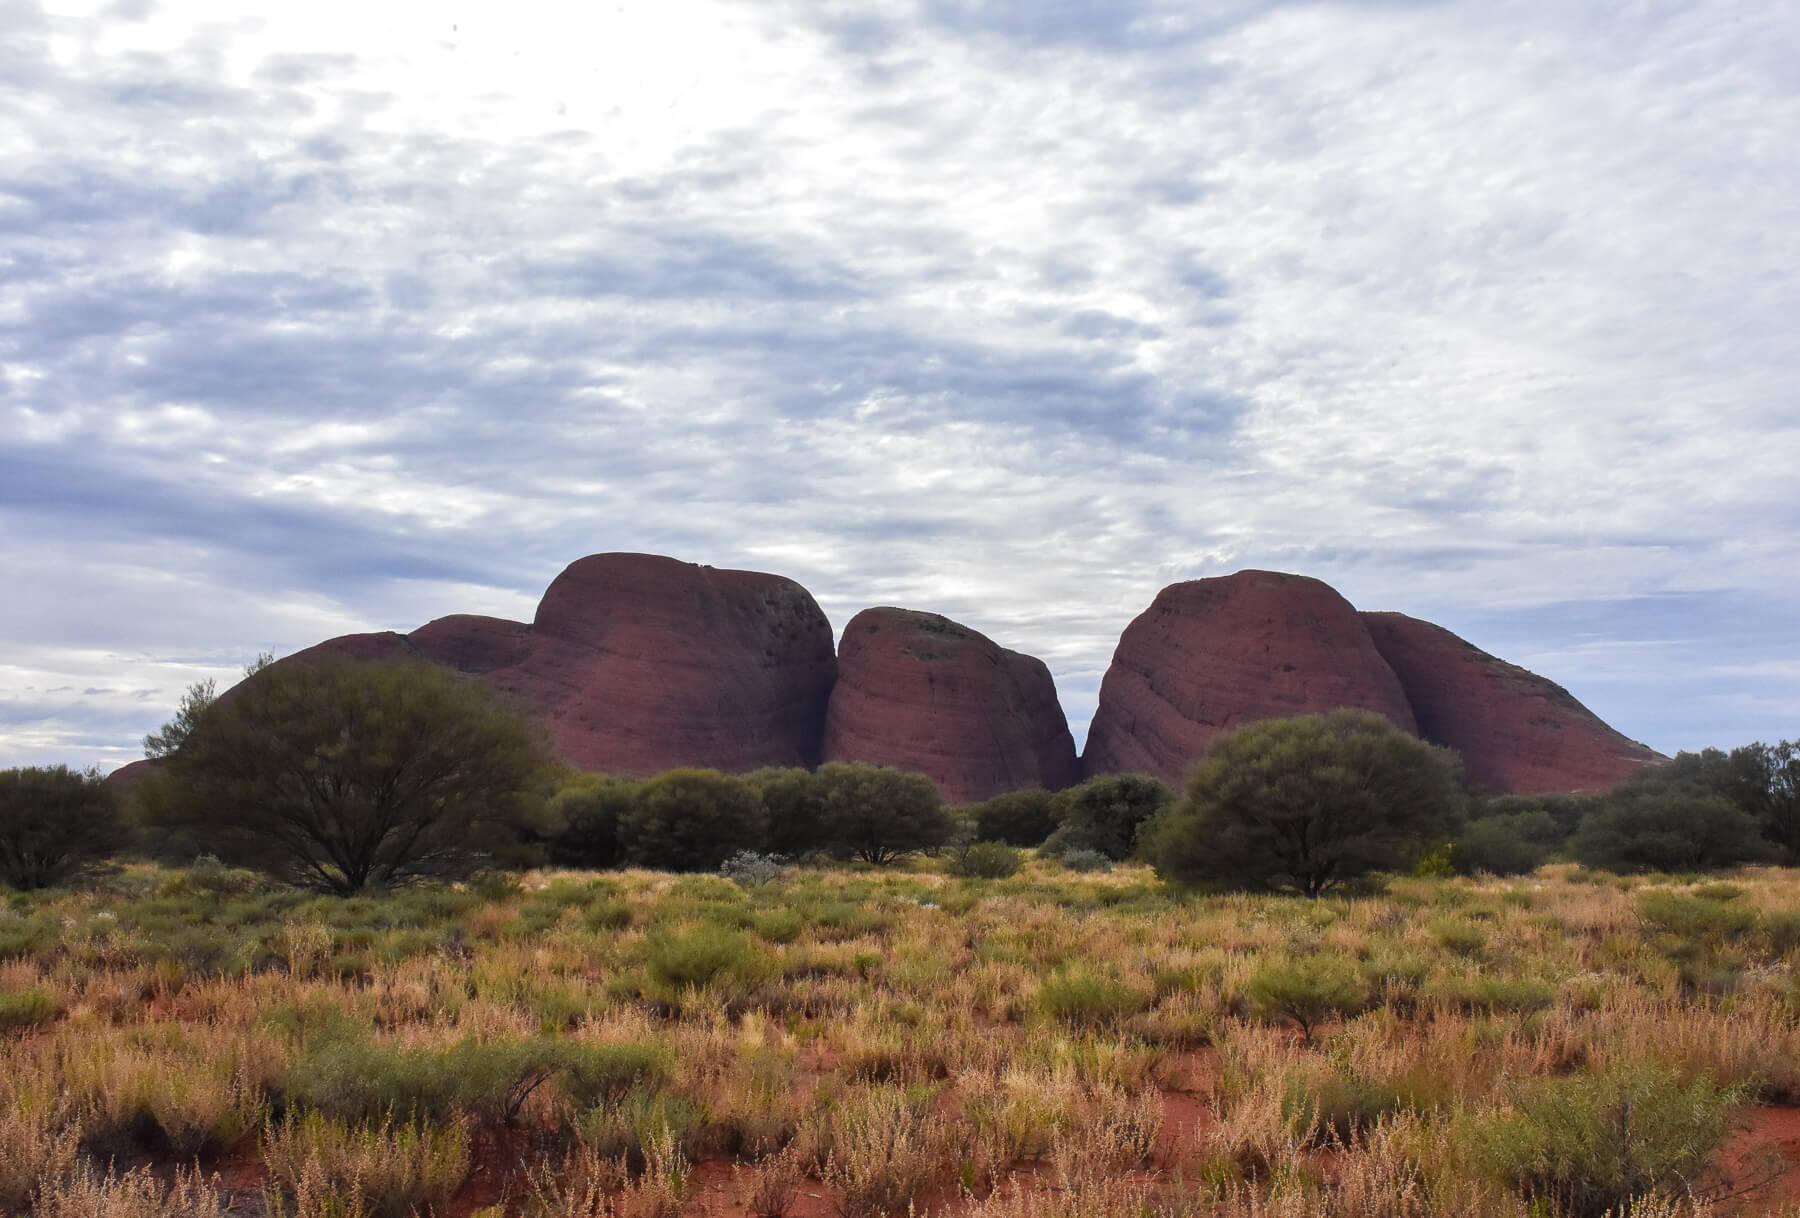 Red stone Olga domes